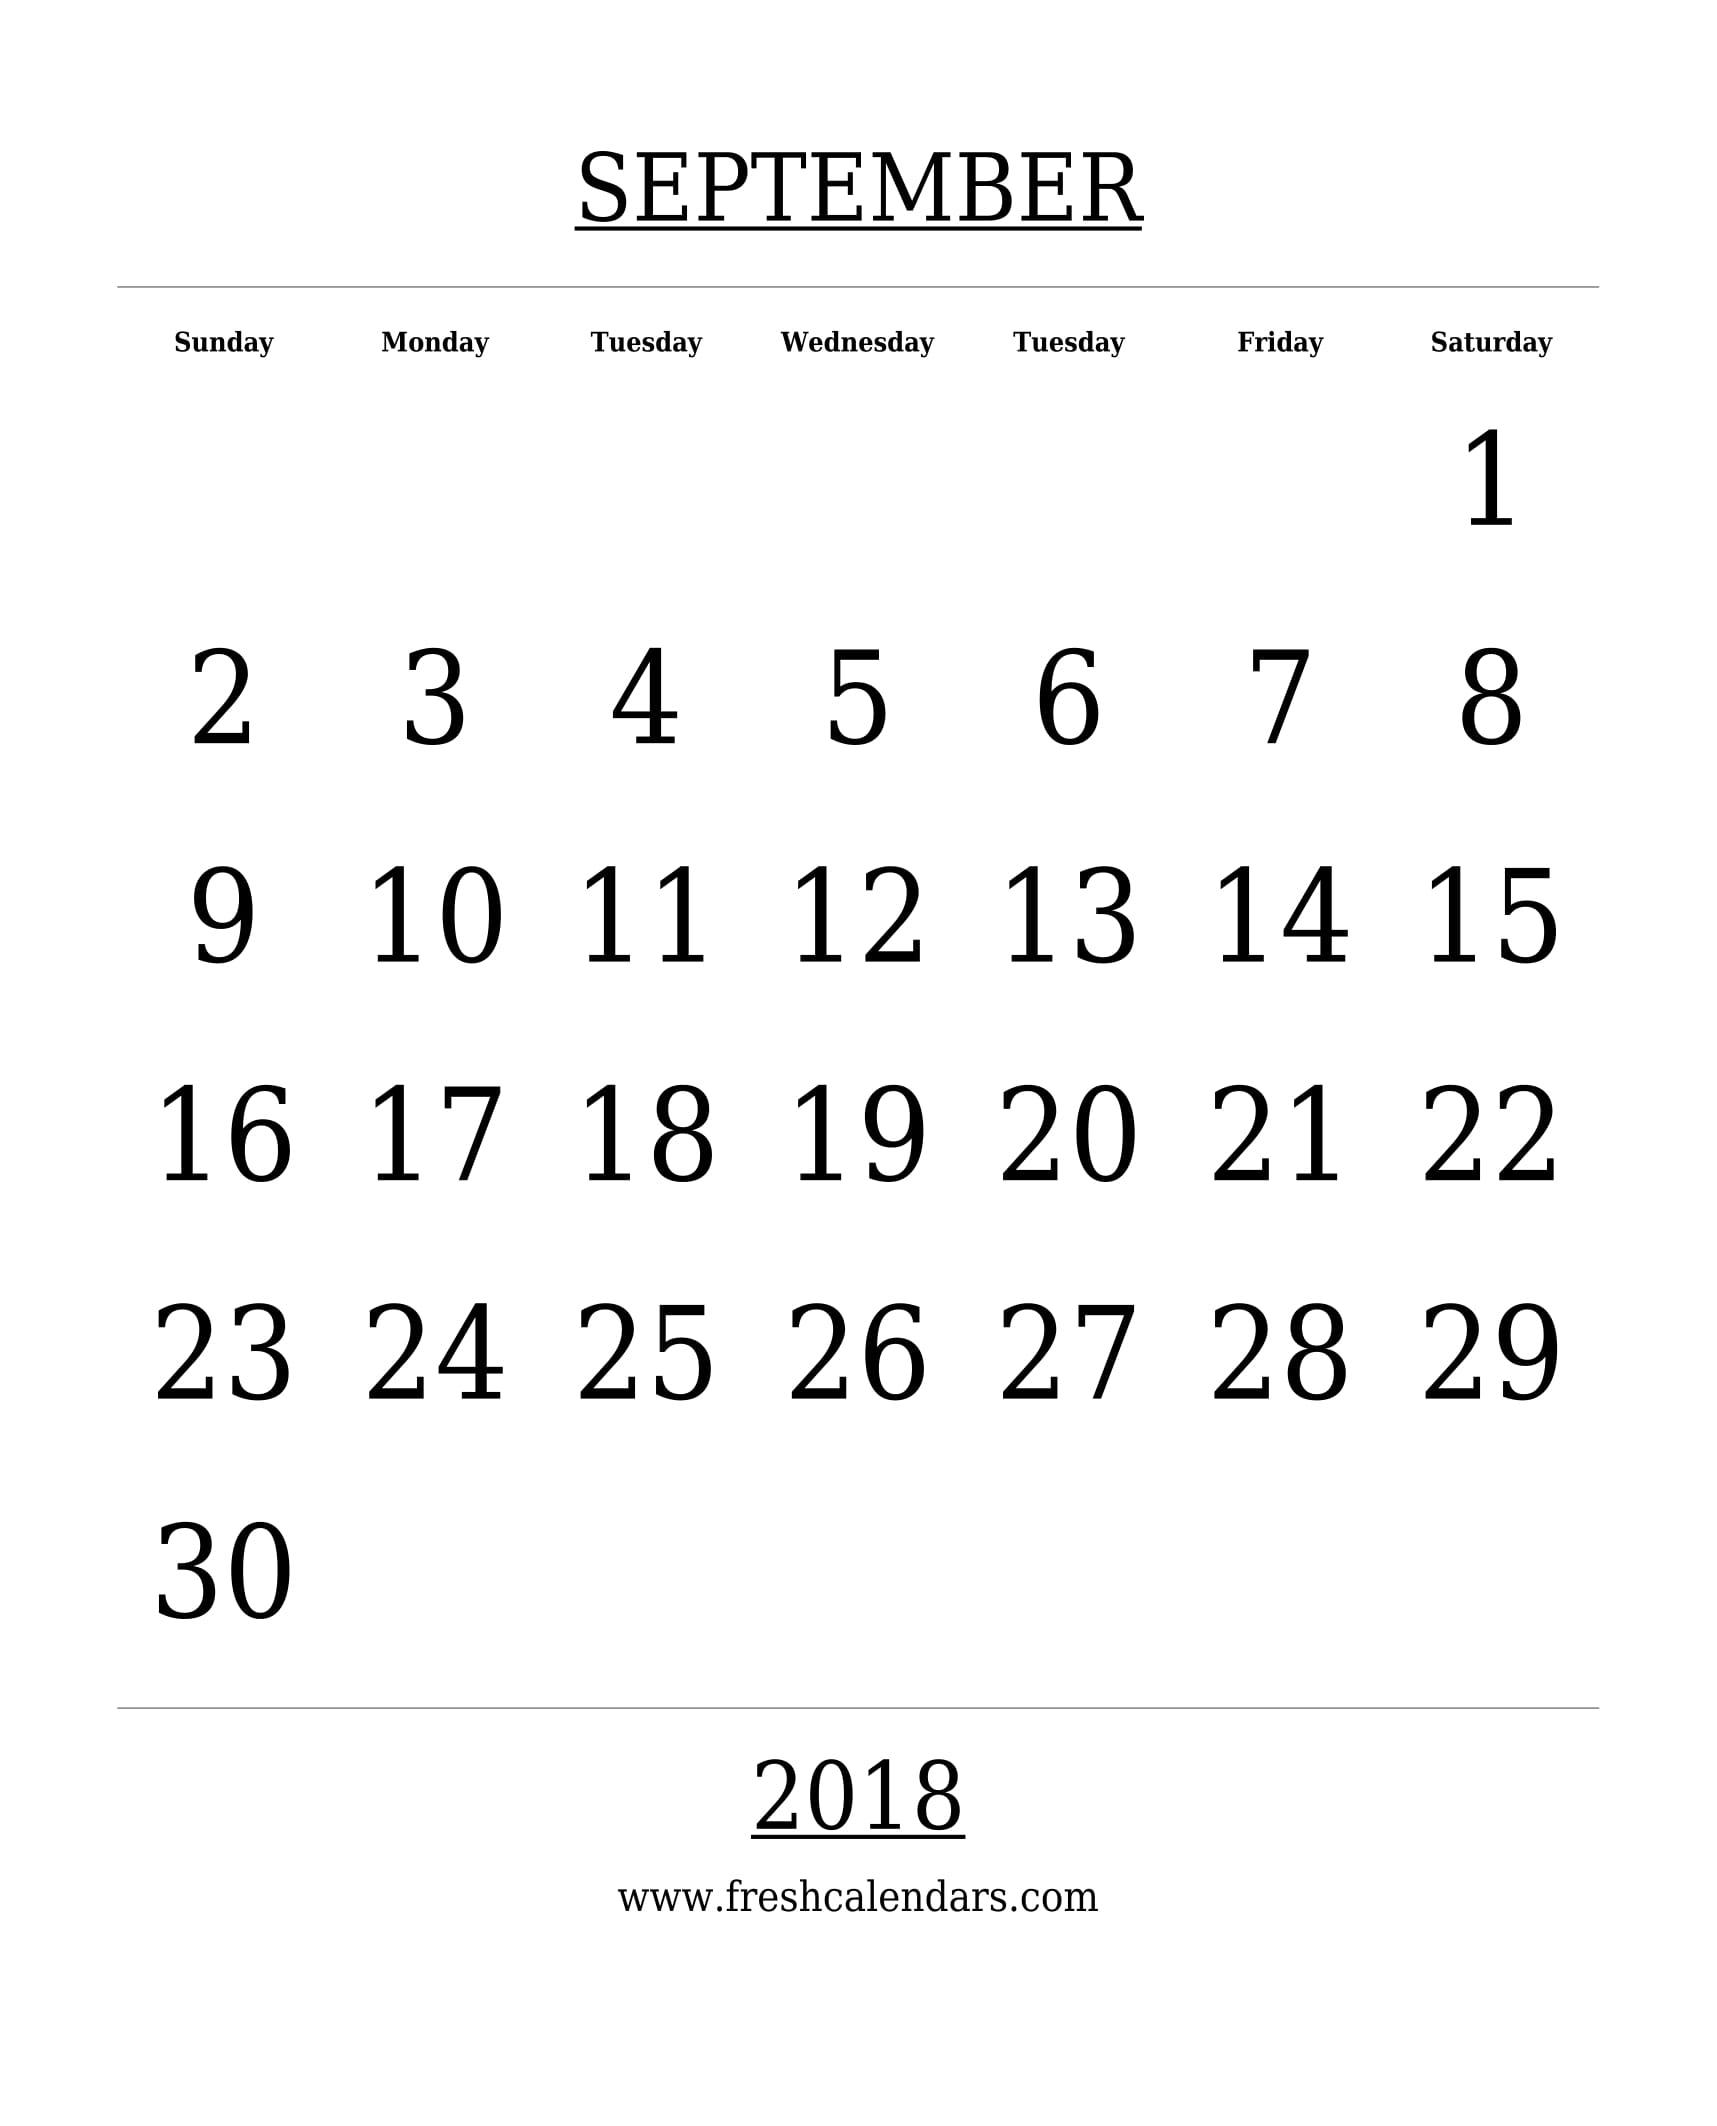 25 Printable September 2018 Calendar Templates Online3abry